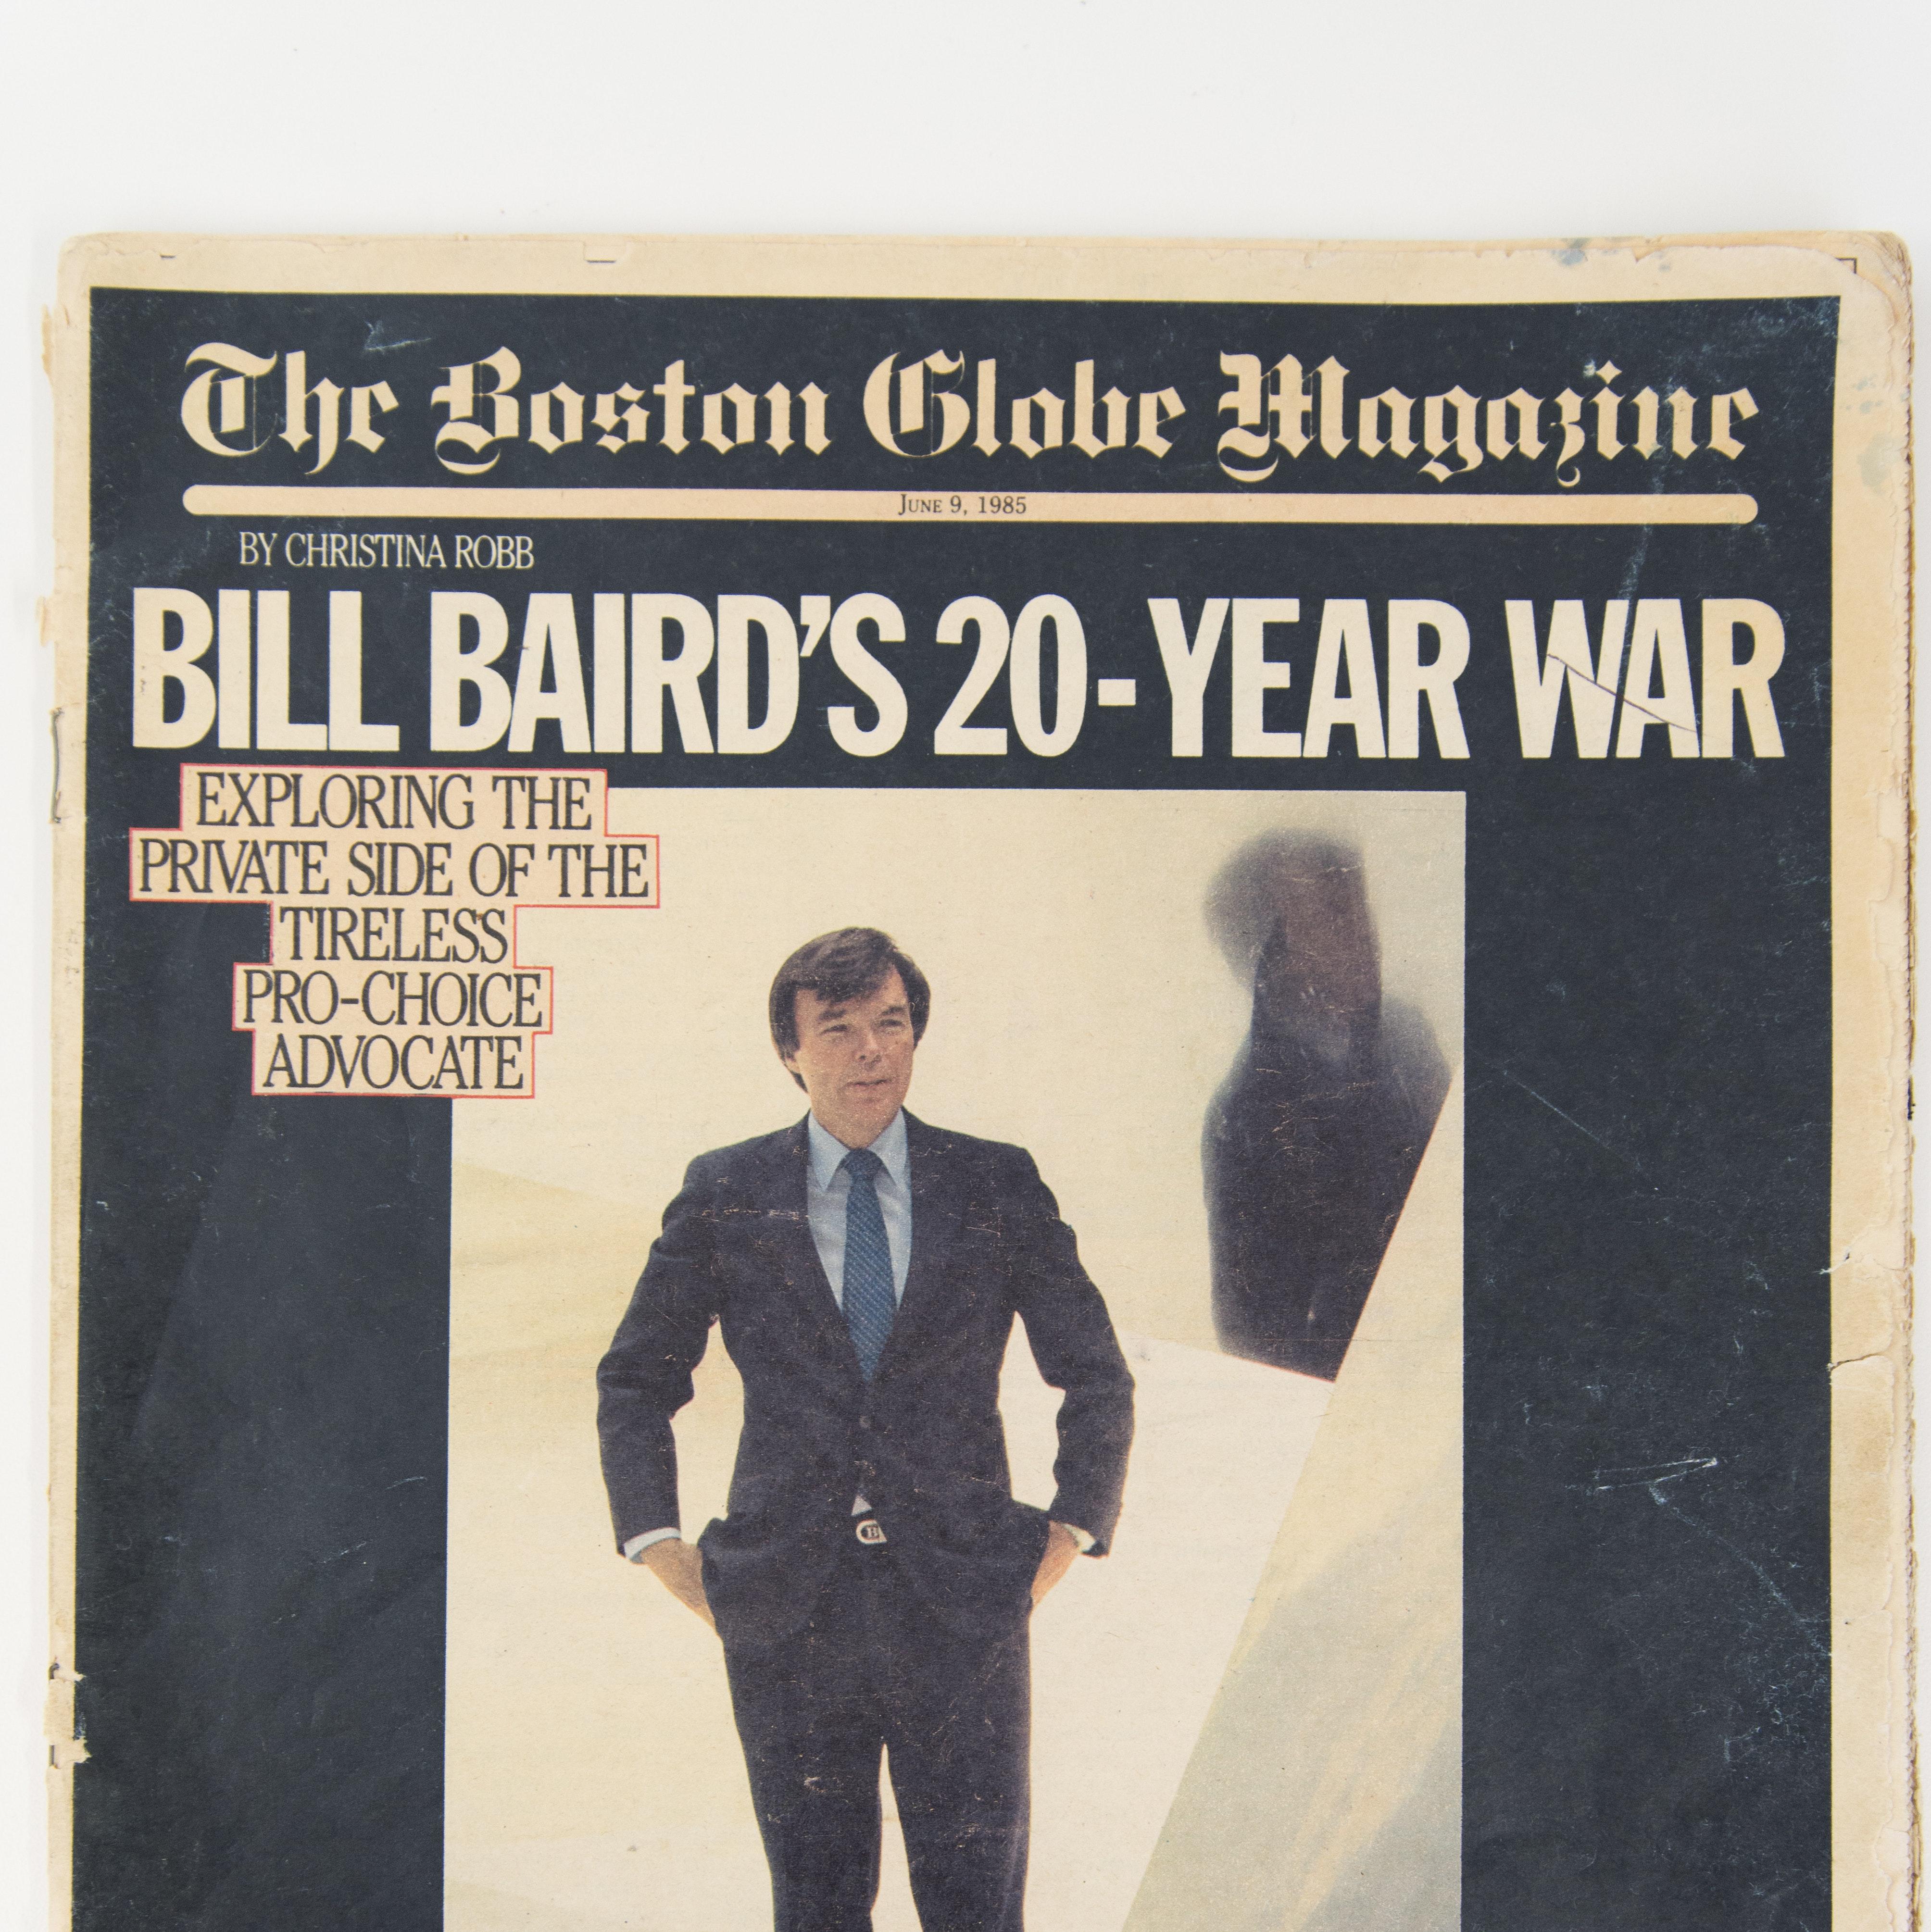 Bill Baird on the cover of the Boston Globe Magazine